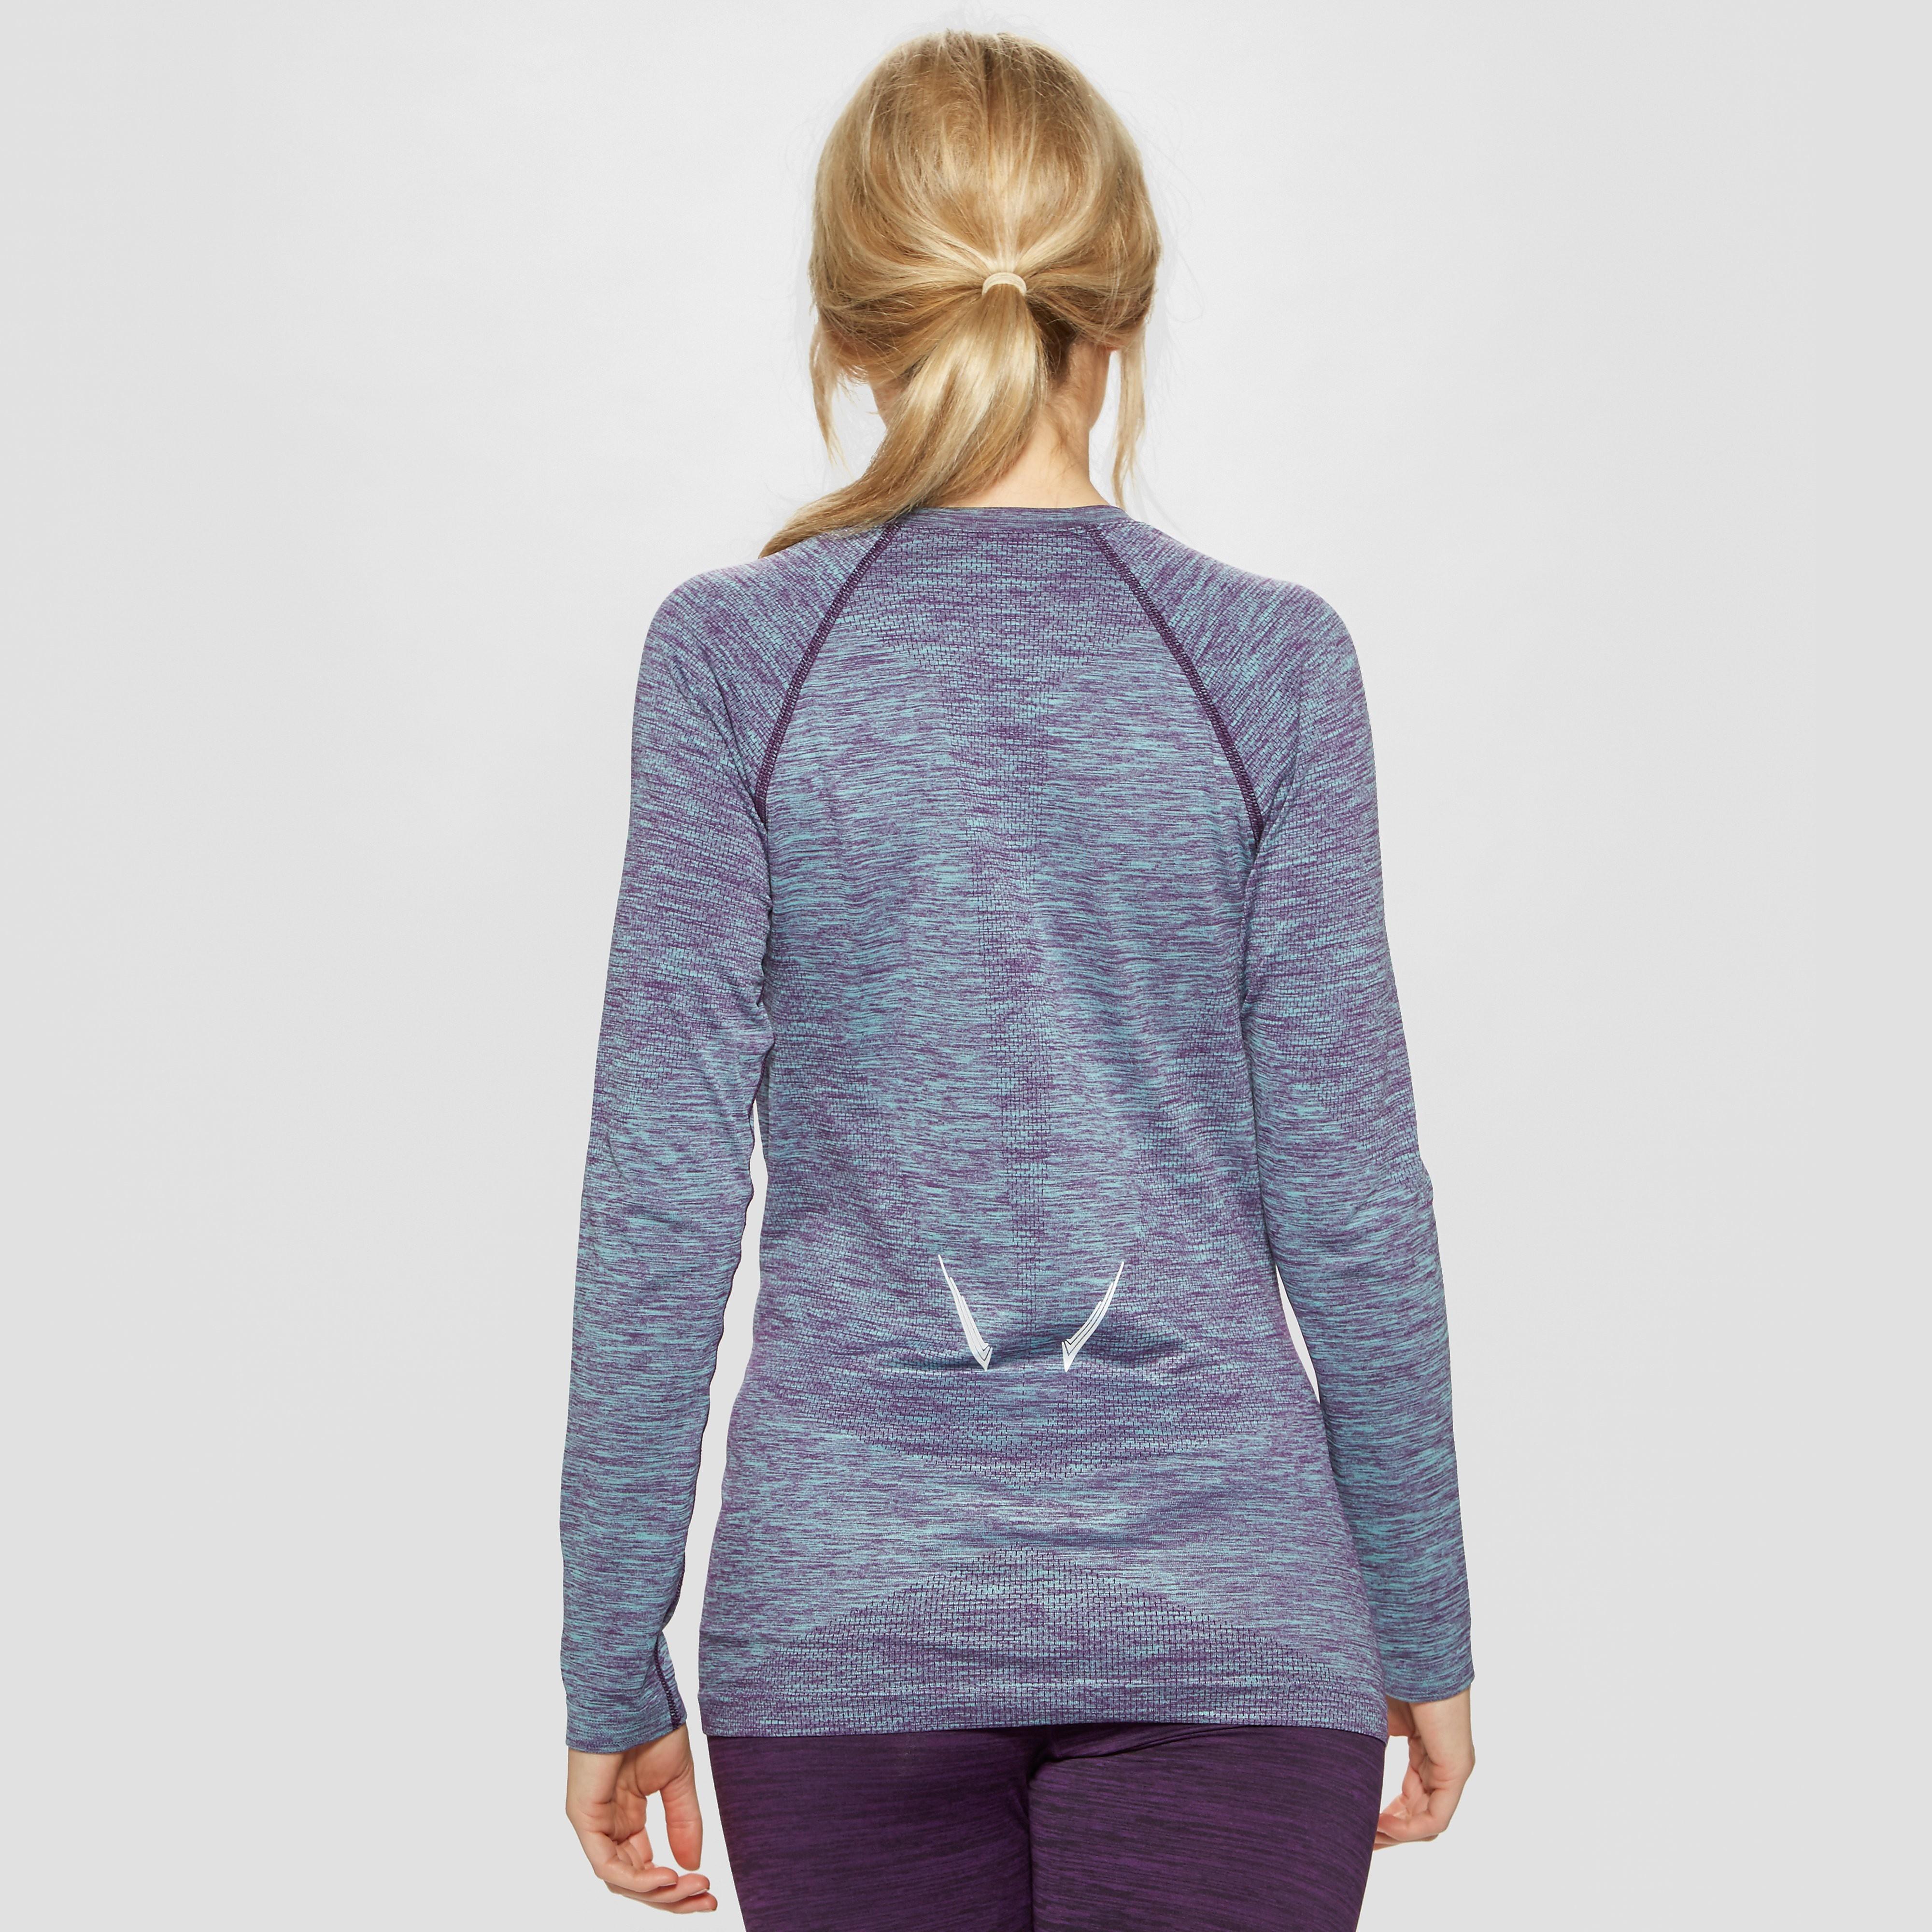 Ronhill Infinity Spacedye Long Sleeve Women's Running Top